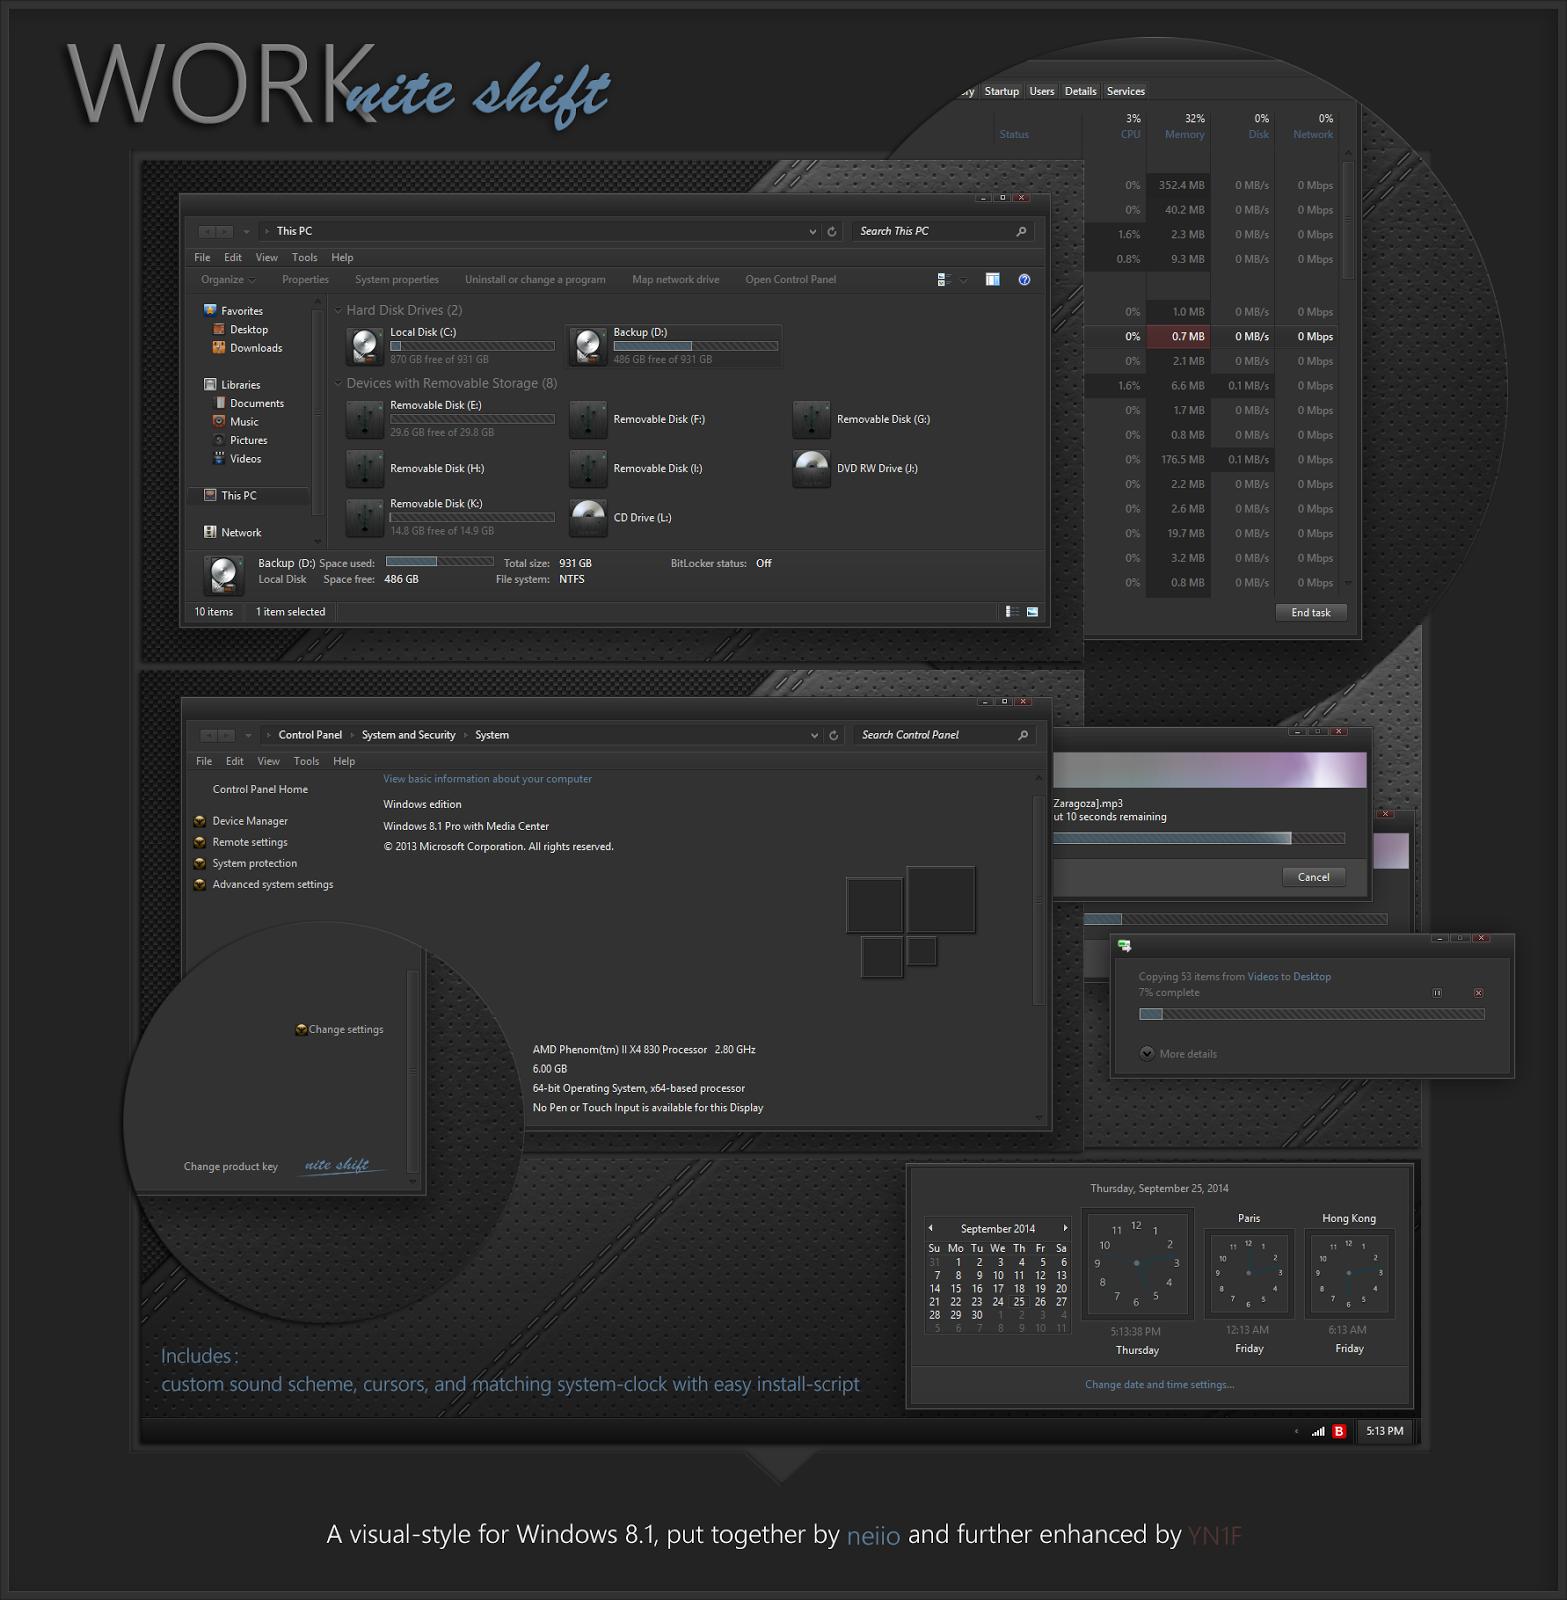 Work Nite Shift Theme For Windows 8 1 Cleodesktop I